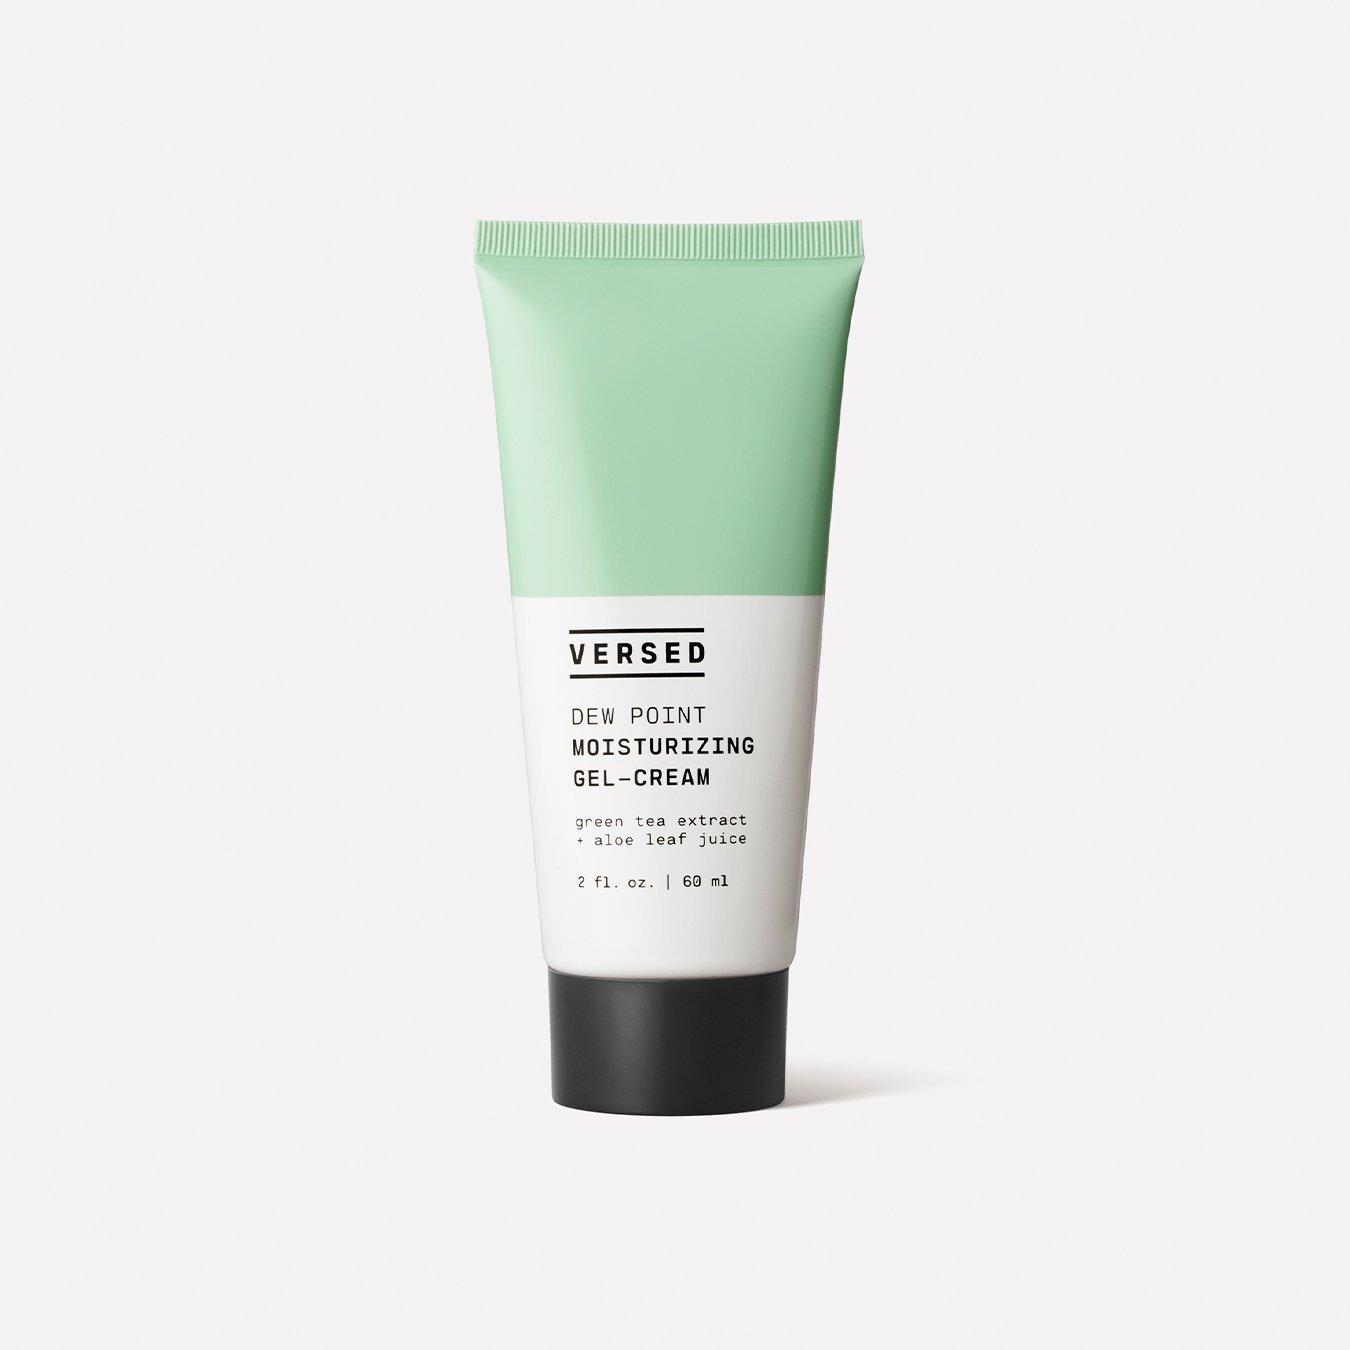 Versed-Skincare-Dew-Point-Moisturizing-Gel-Cream-02_1800x.jpg